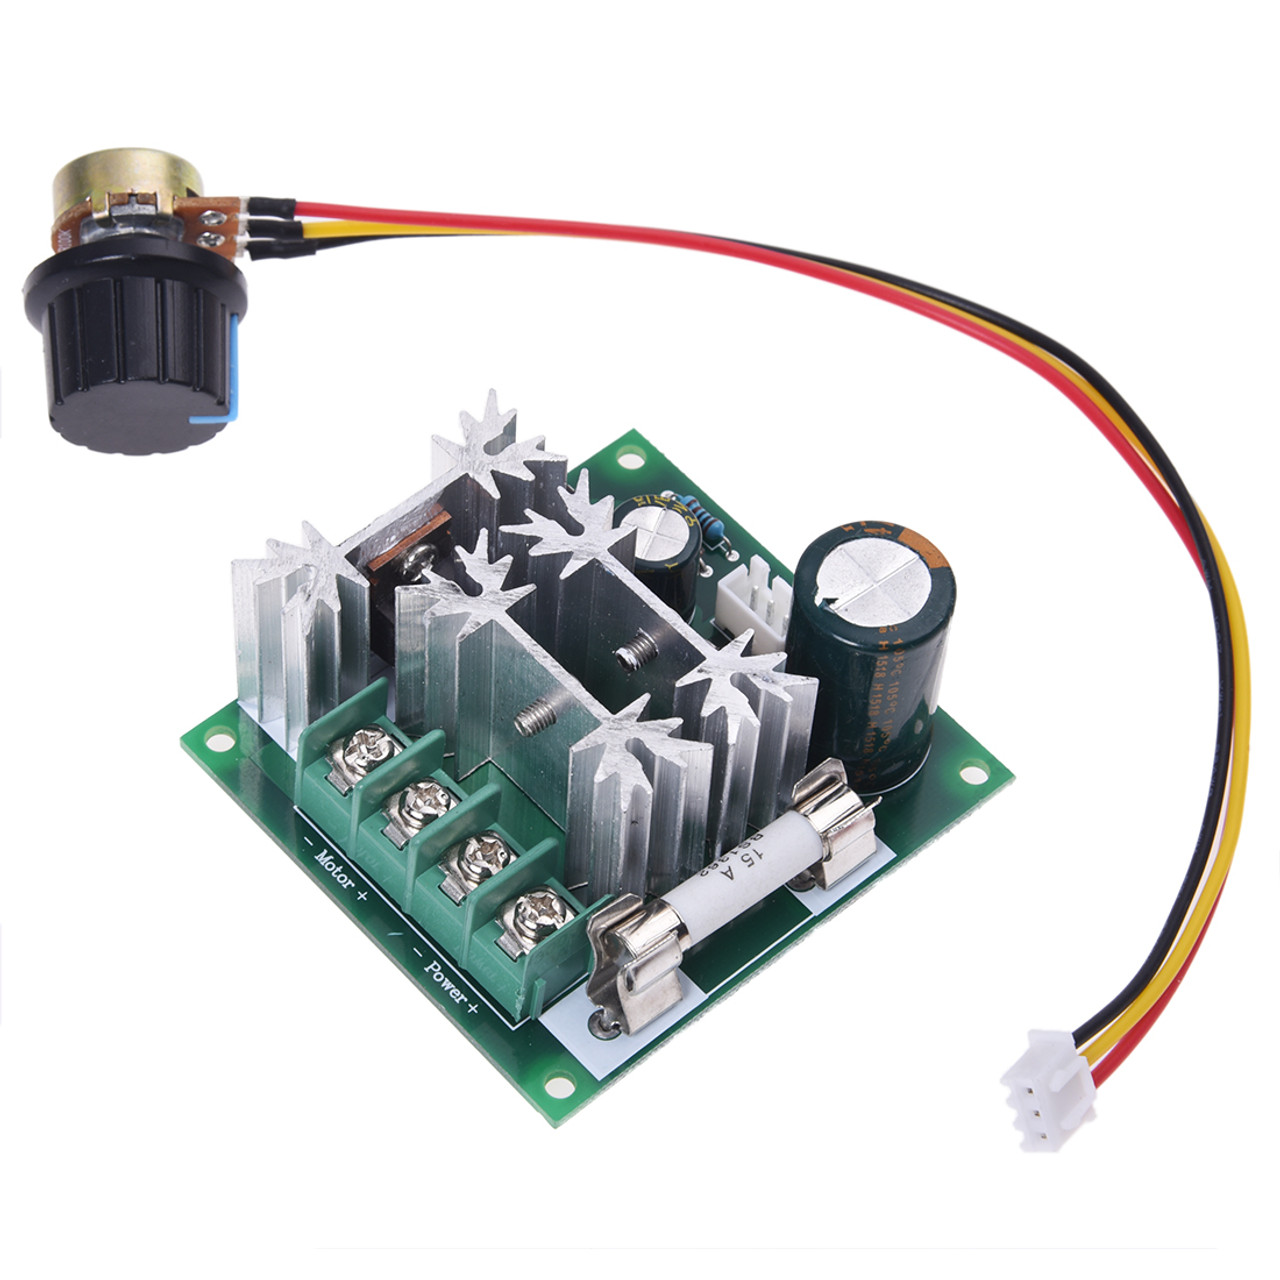 6V-90V 15A Pulse Width PWM DC Motor Speed Controller - Pixel ...